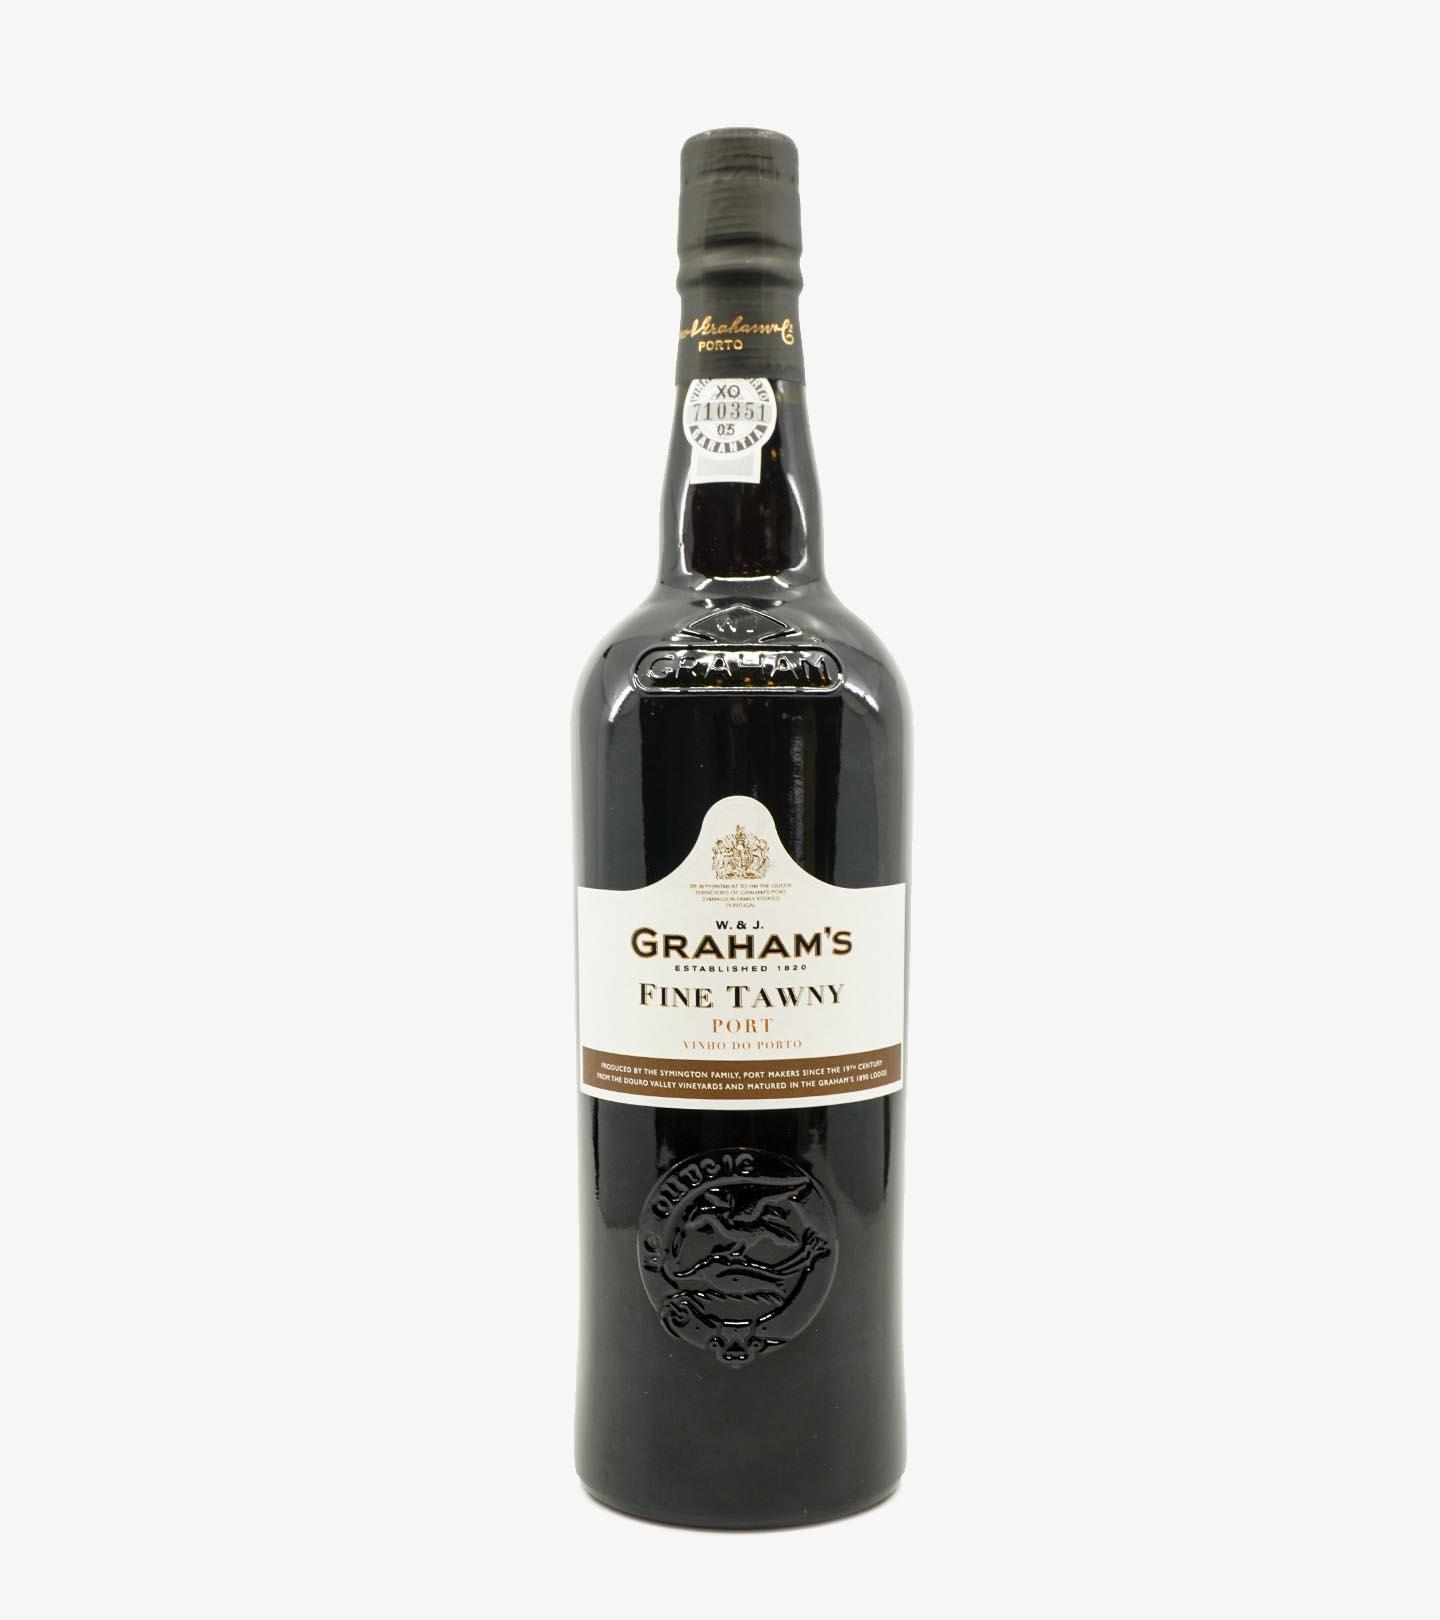 Vinho Porto Graham's Fine Tawny 75cl